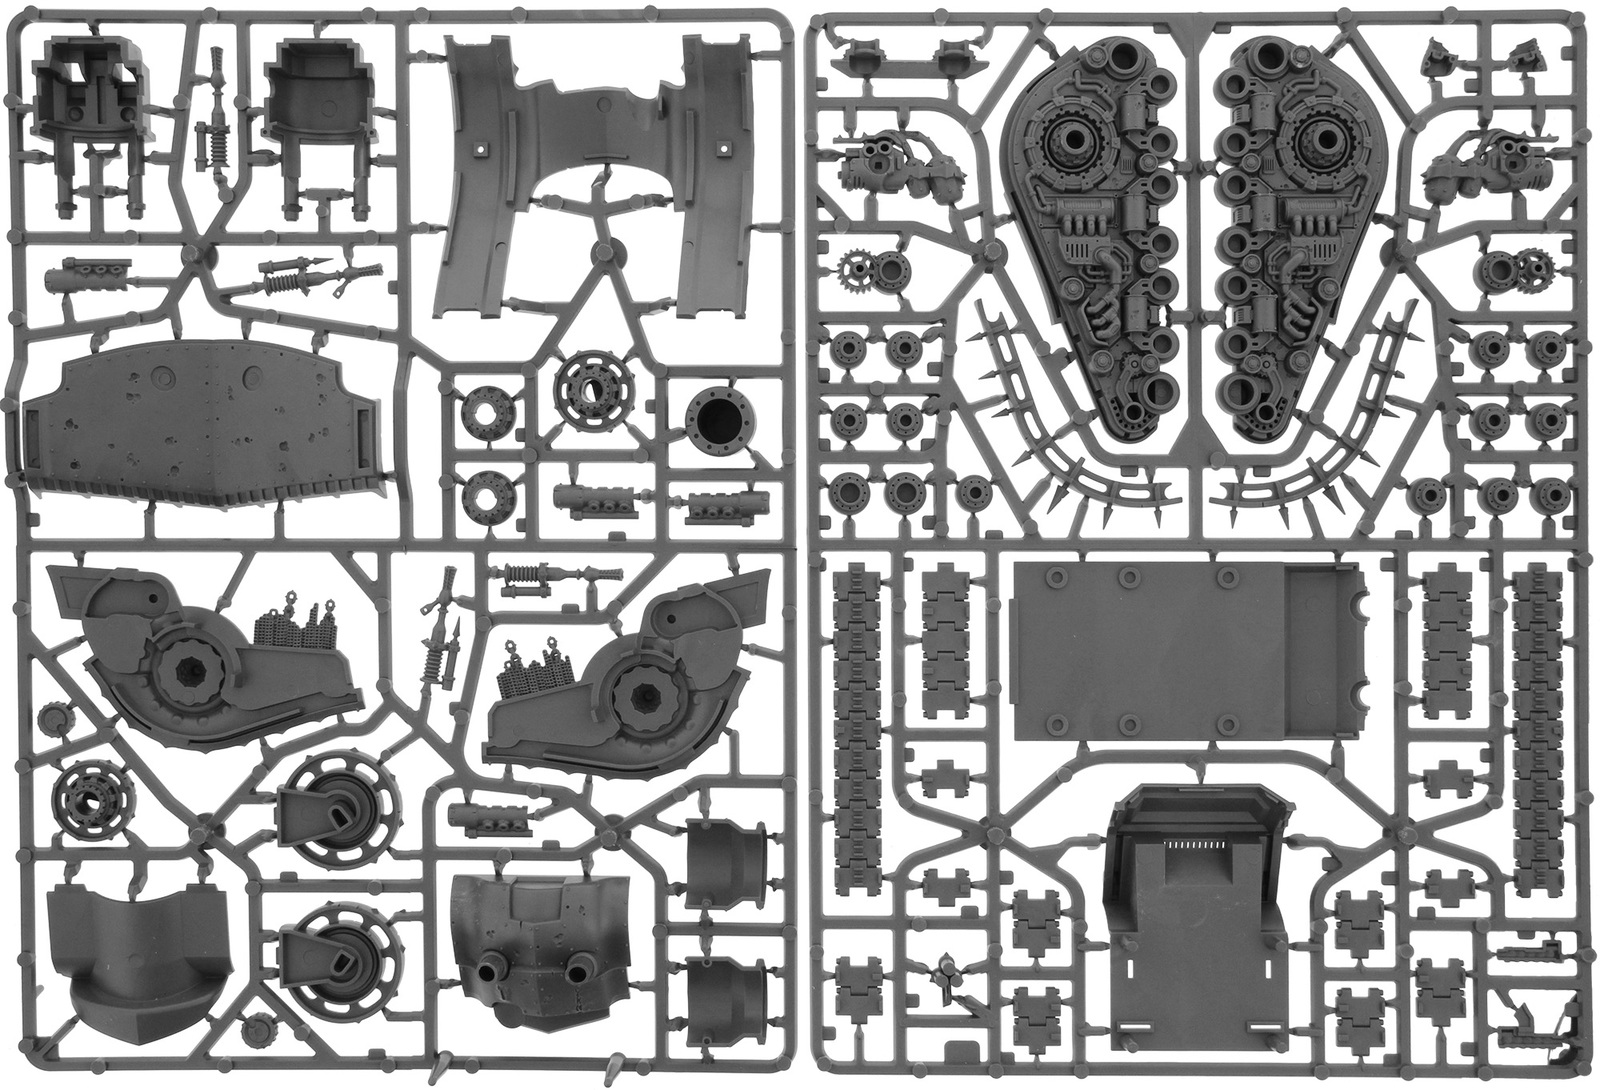 Warhammer 40,000: Death Guard - Plagueburst Crawler image